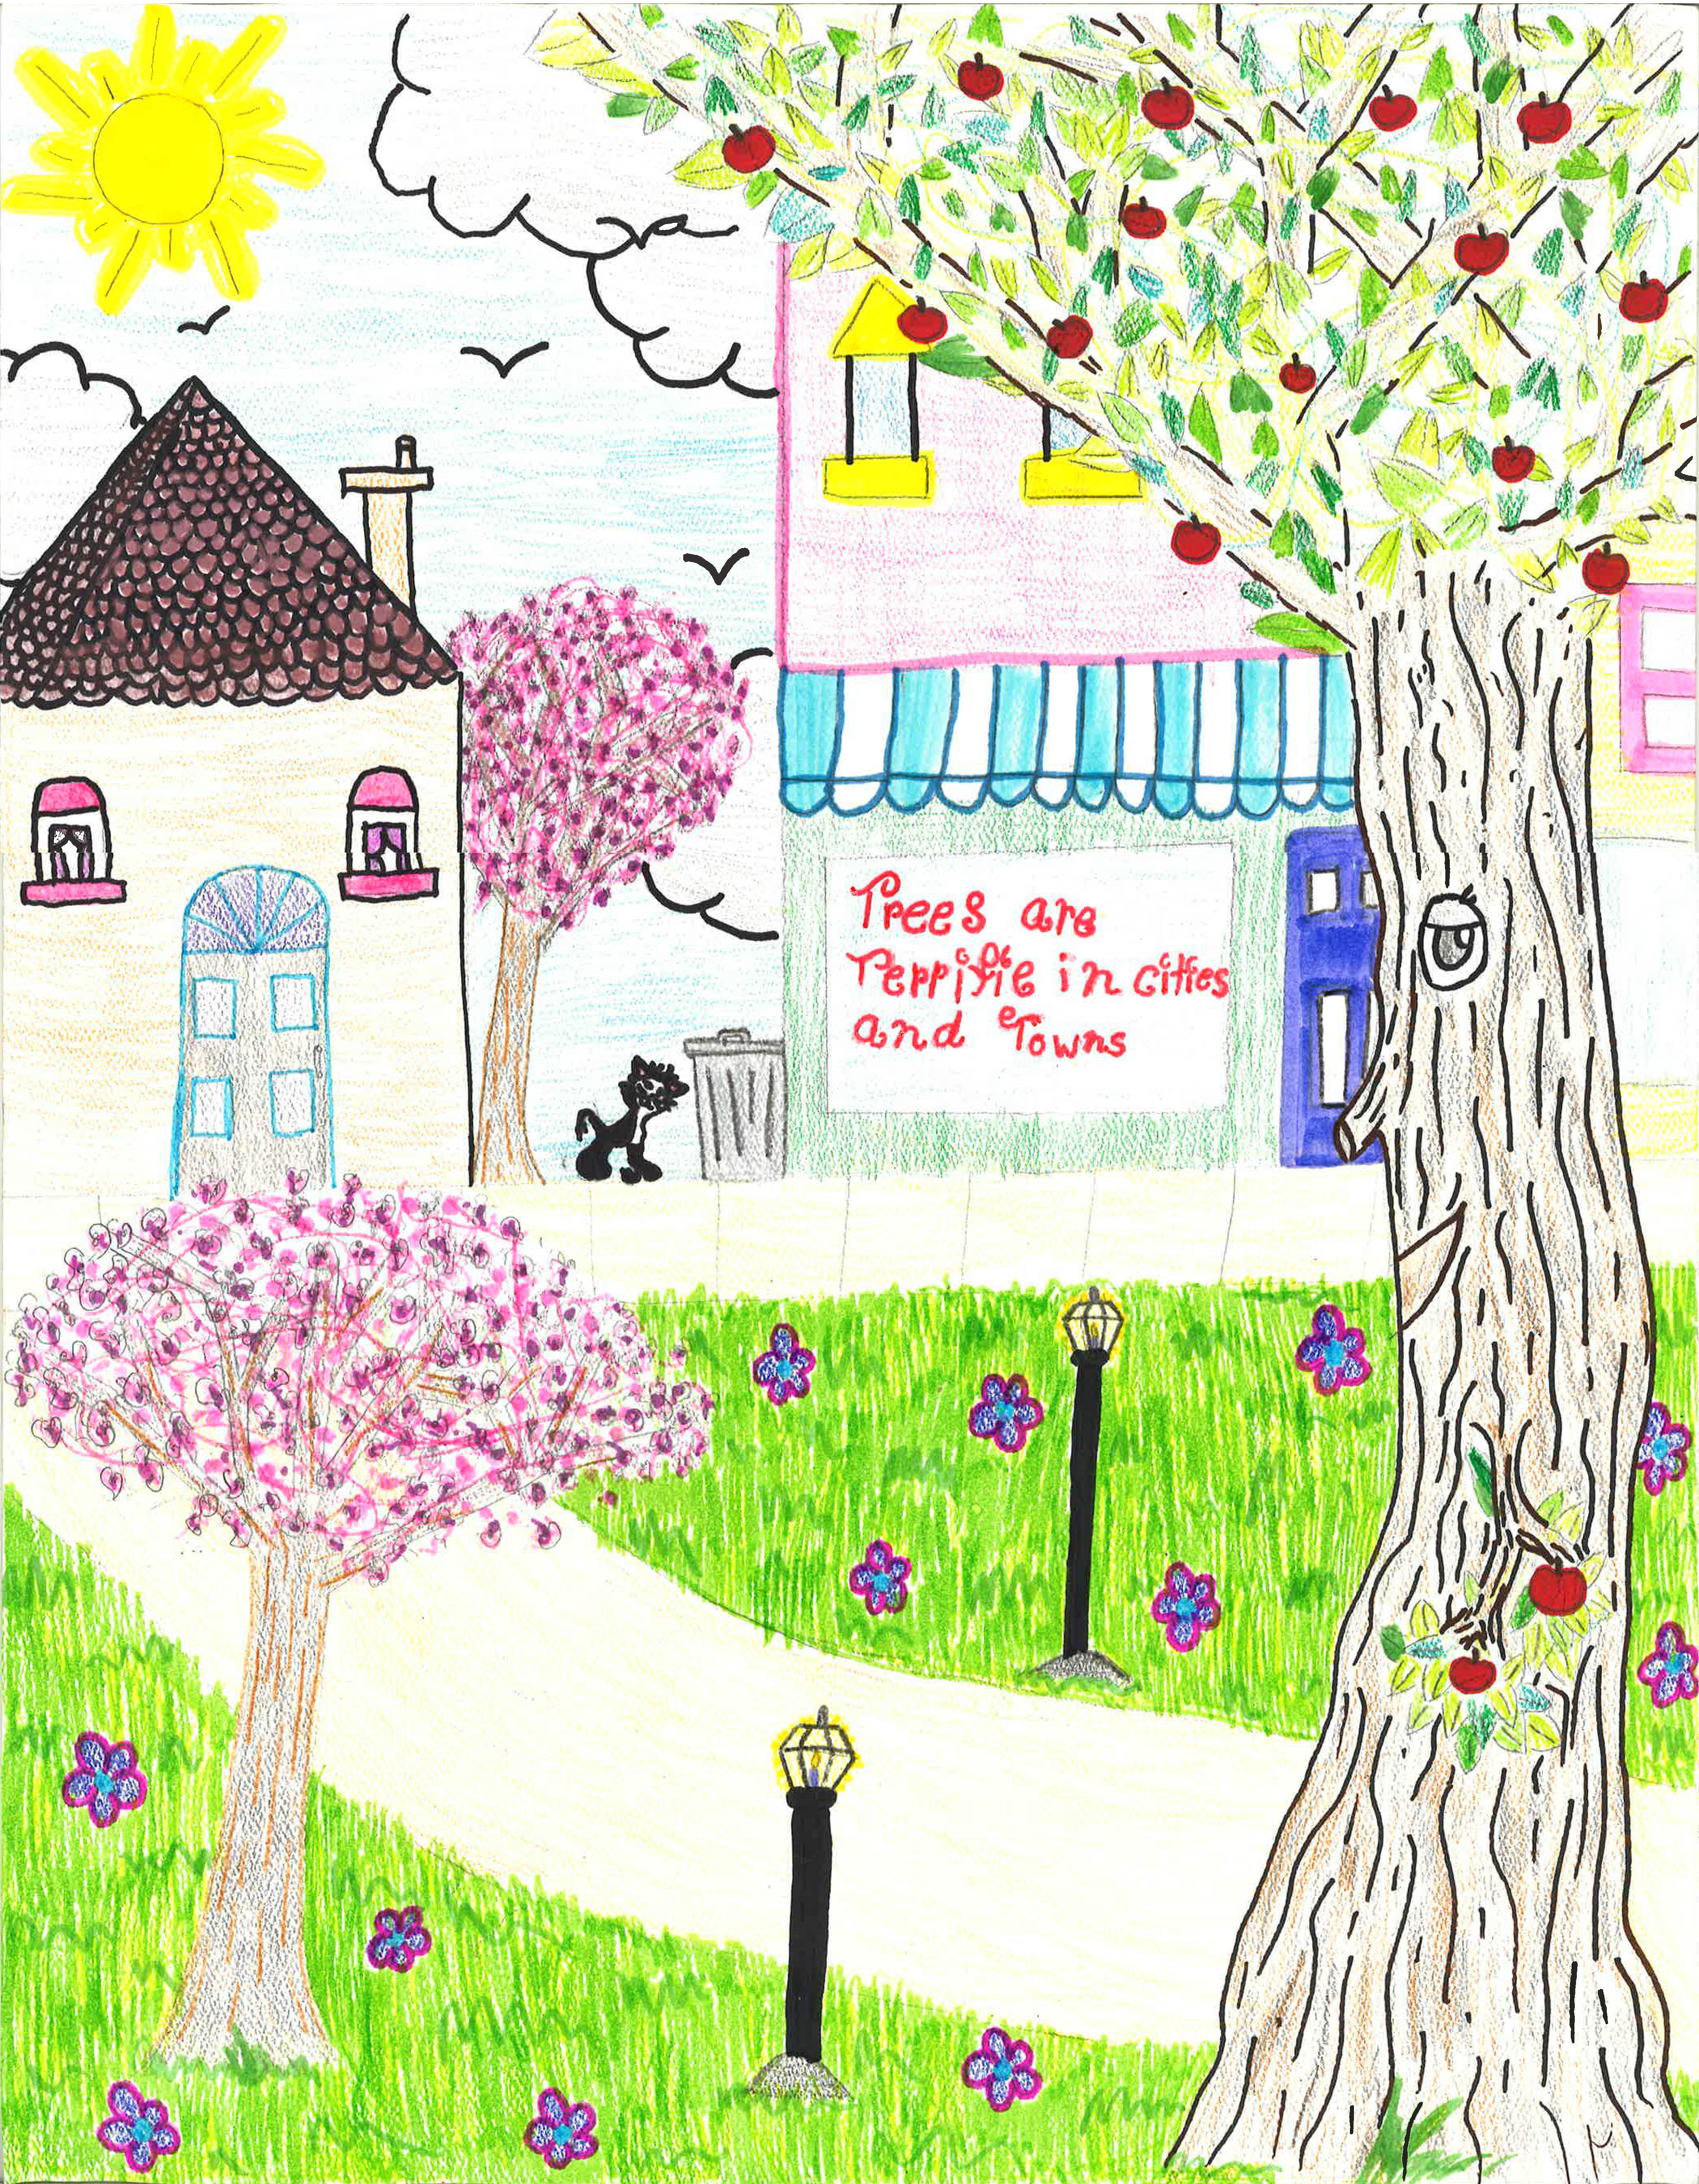 2014 School Poster Contest » Delaware Trees